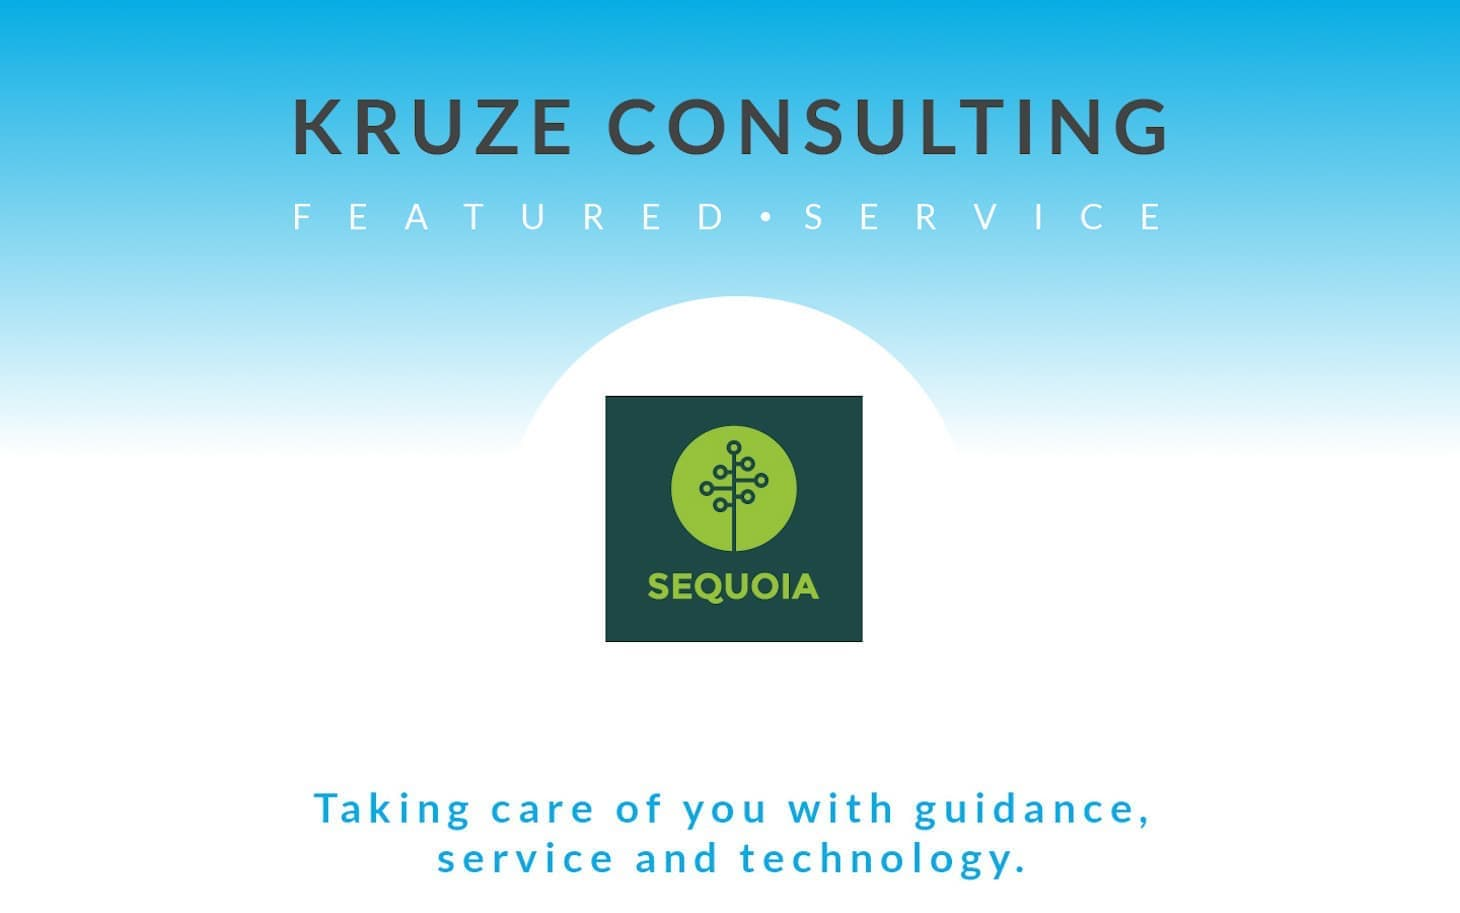 Featured Service - Sequoia